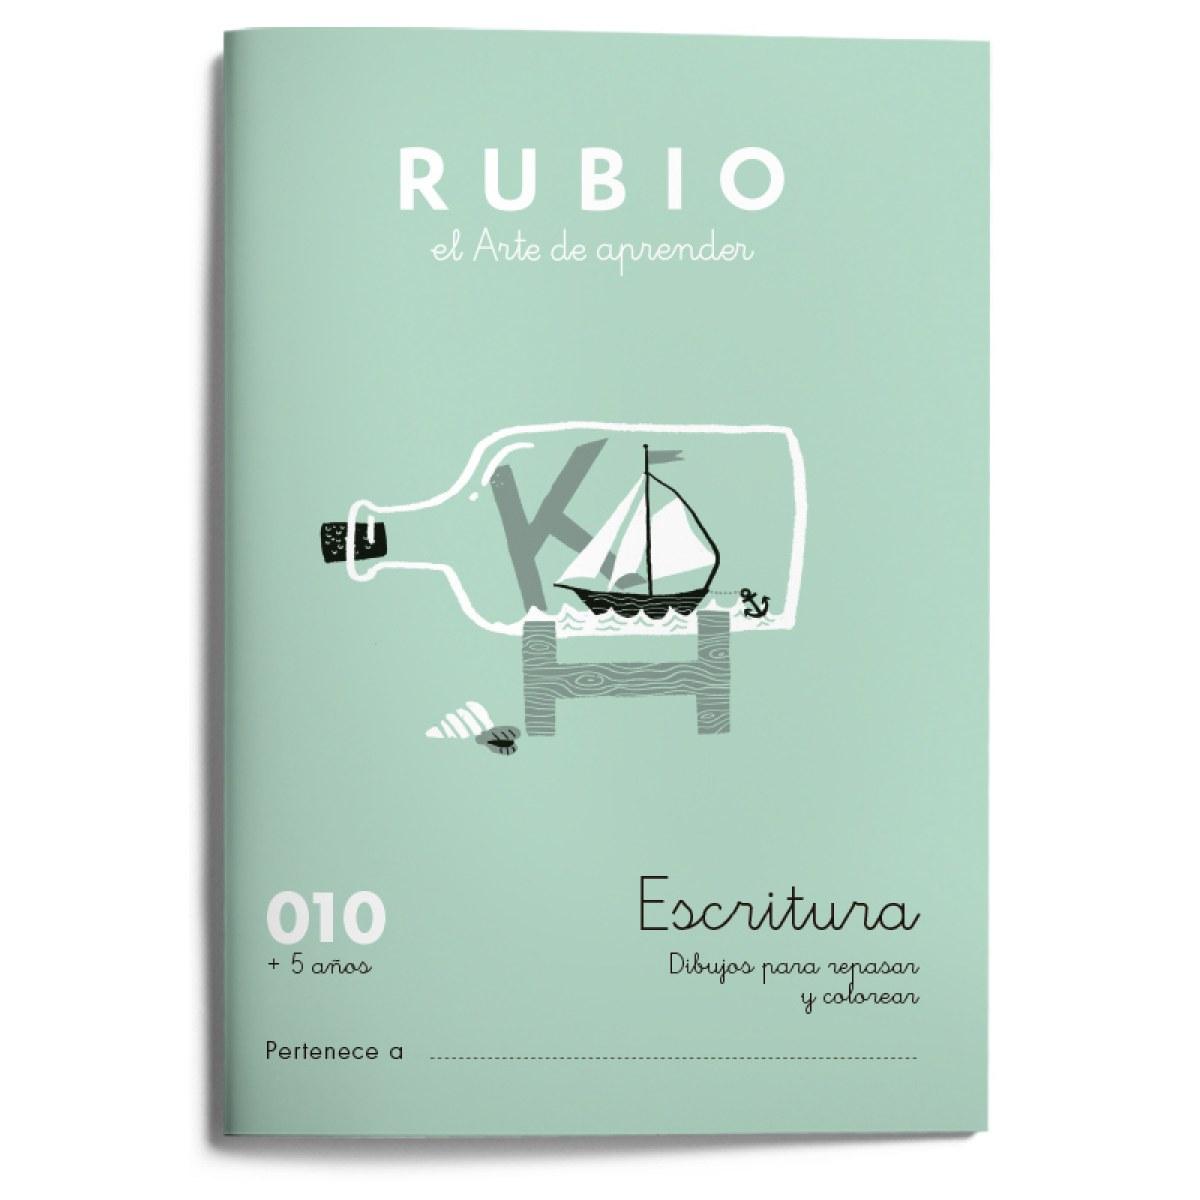 ESCRITURA RUBIO 010 DIBUJOS